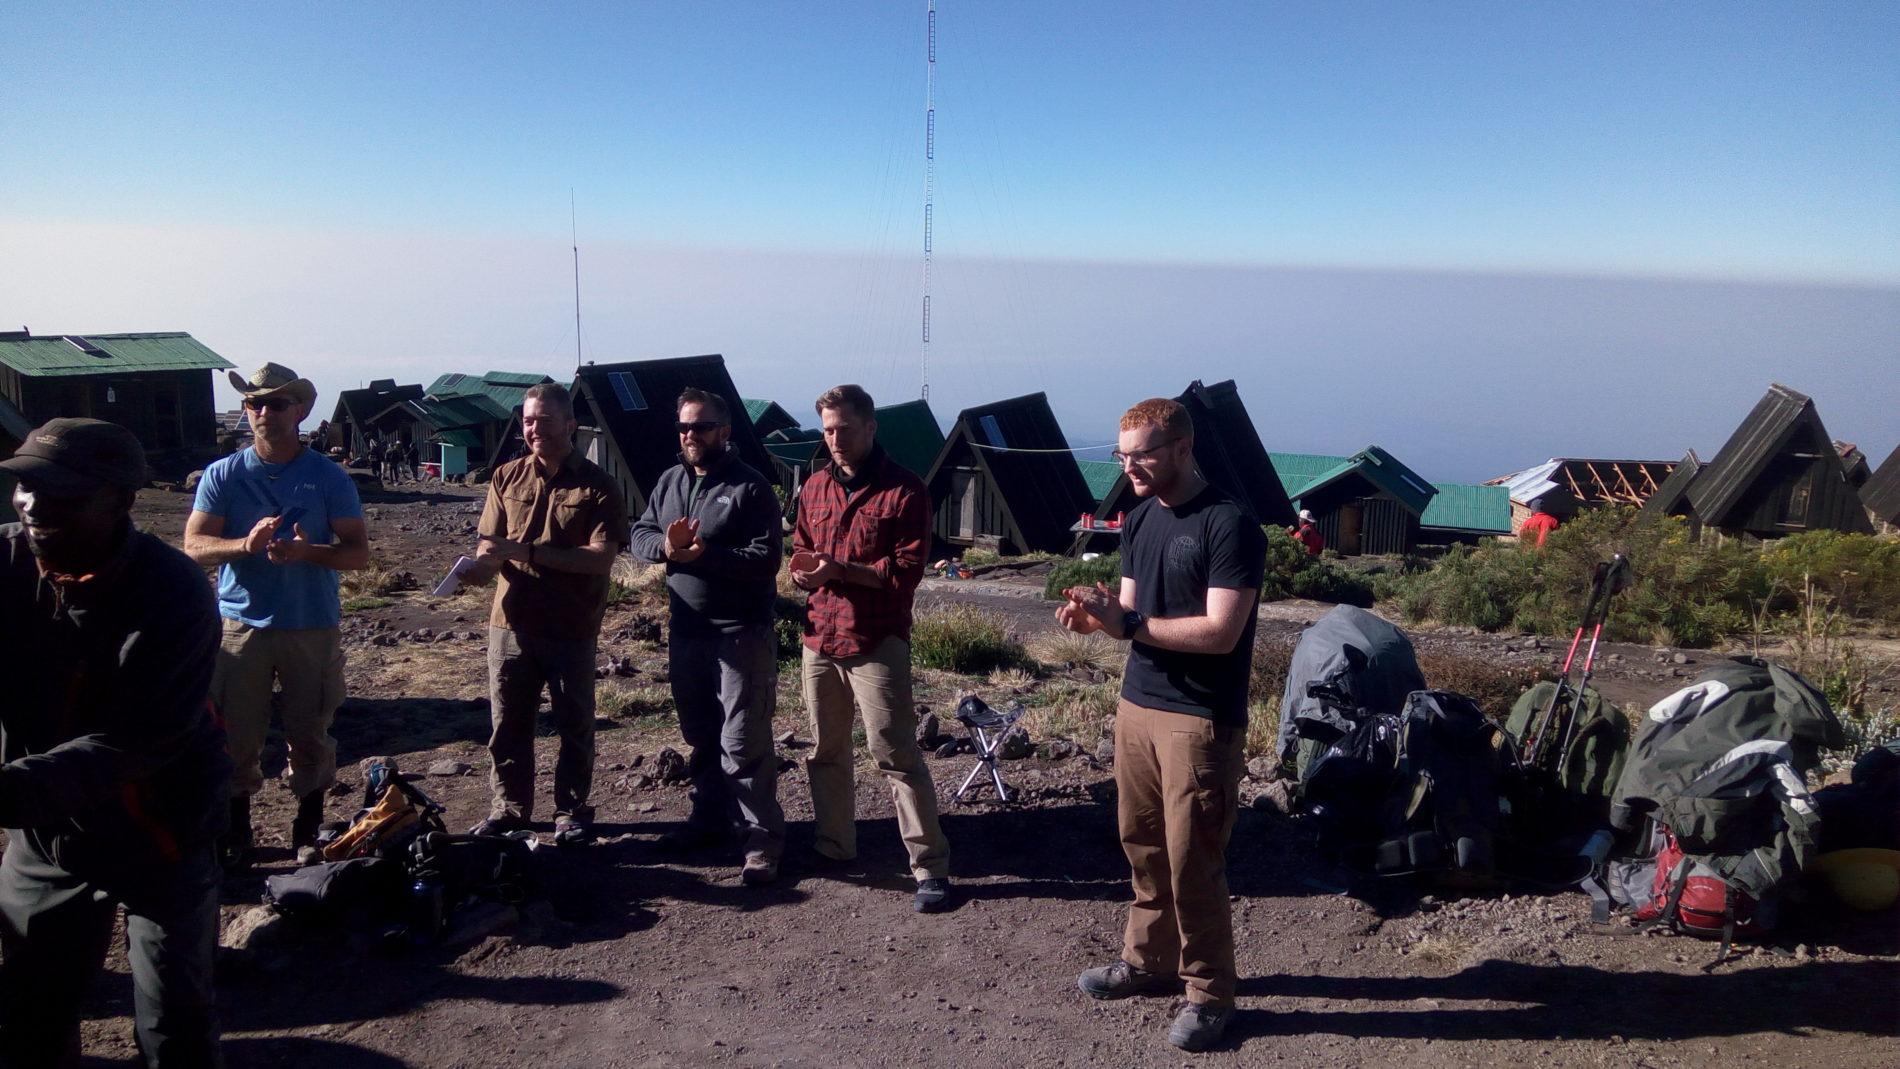 Kilimanjaro climb camp